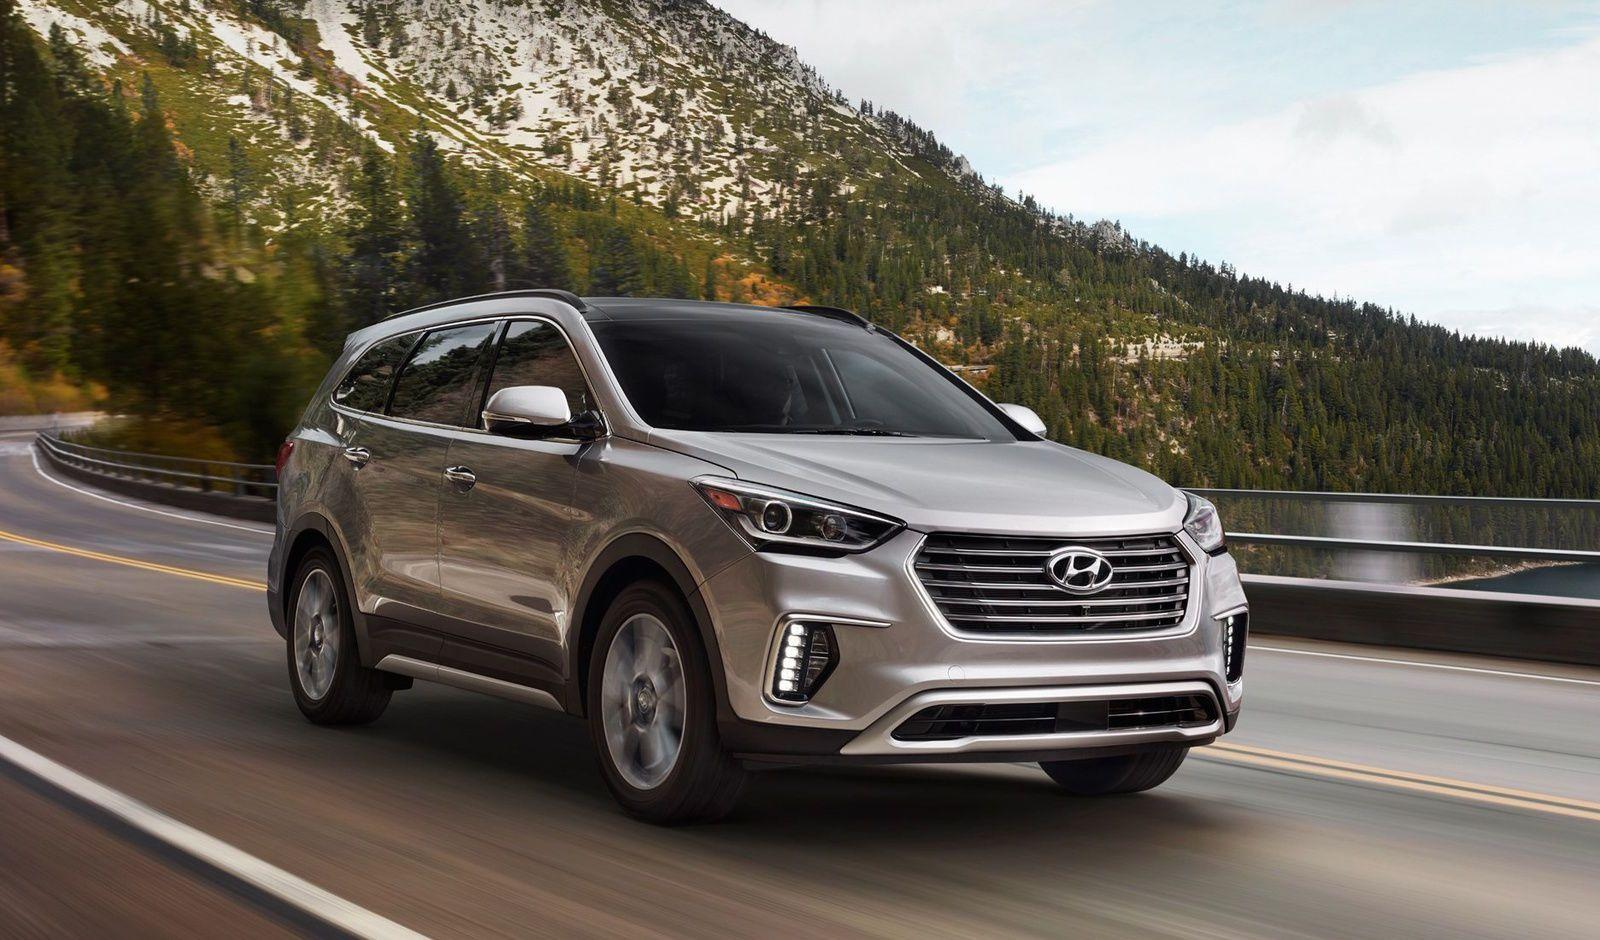 2017 Hyundai Santa Fe Sport Hyundai santa fe sport